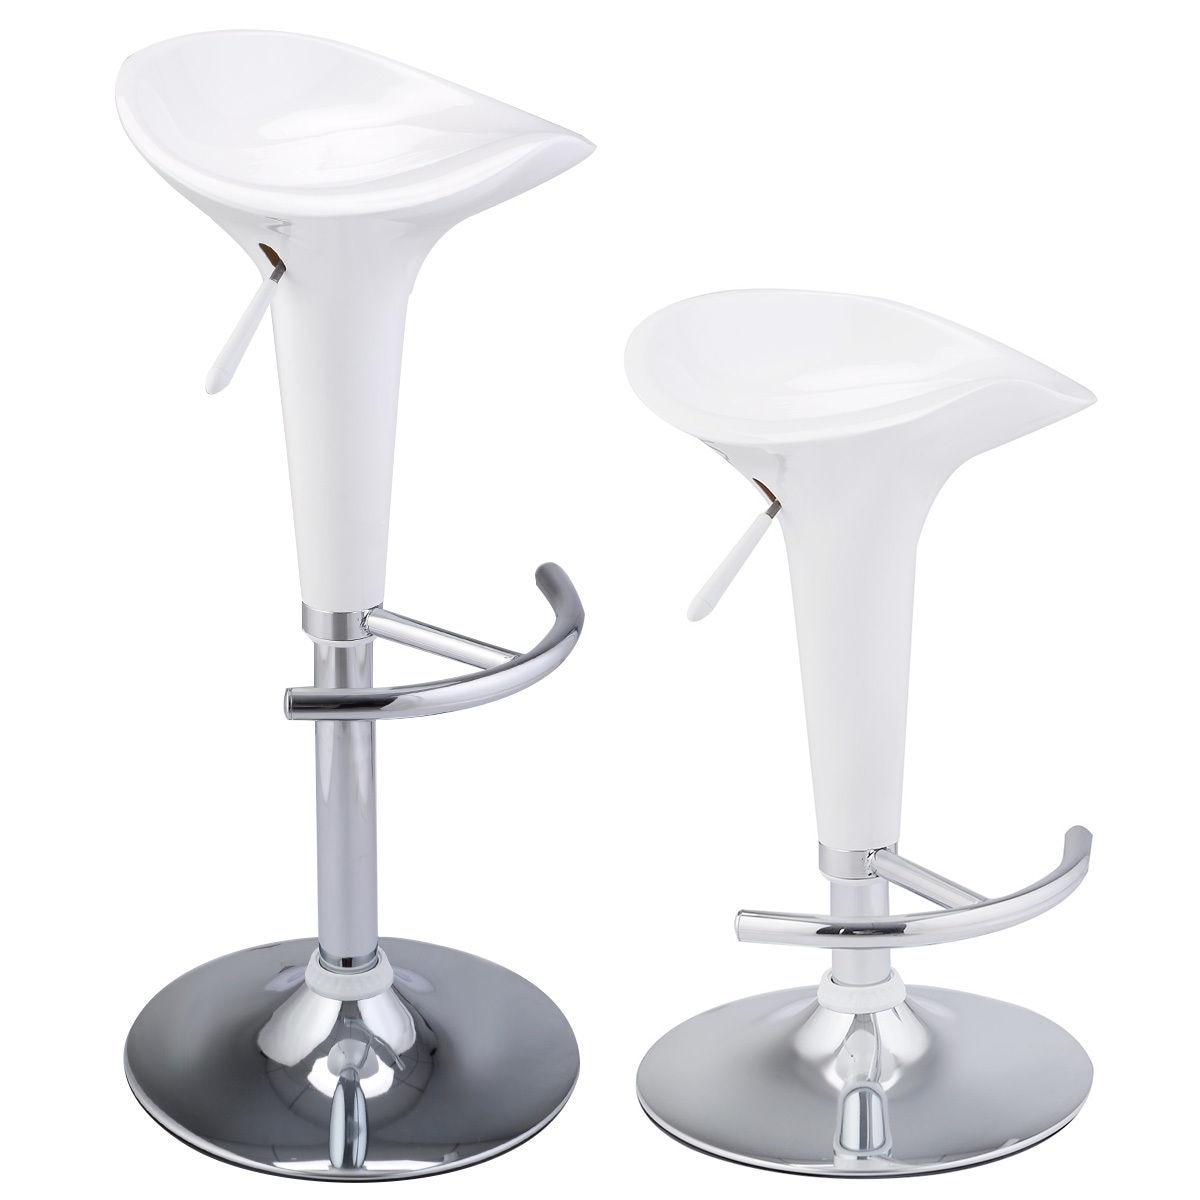 Giantex 2 Pcs Modern Bombo Style Swivel Barstools Adjustable Counter Chair Bar Stools White Pub Lifting Furniture HW51432WH